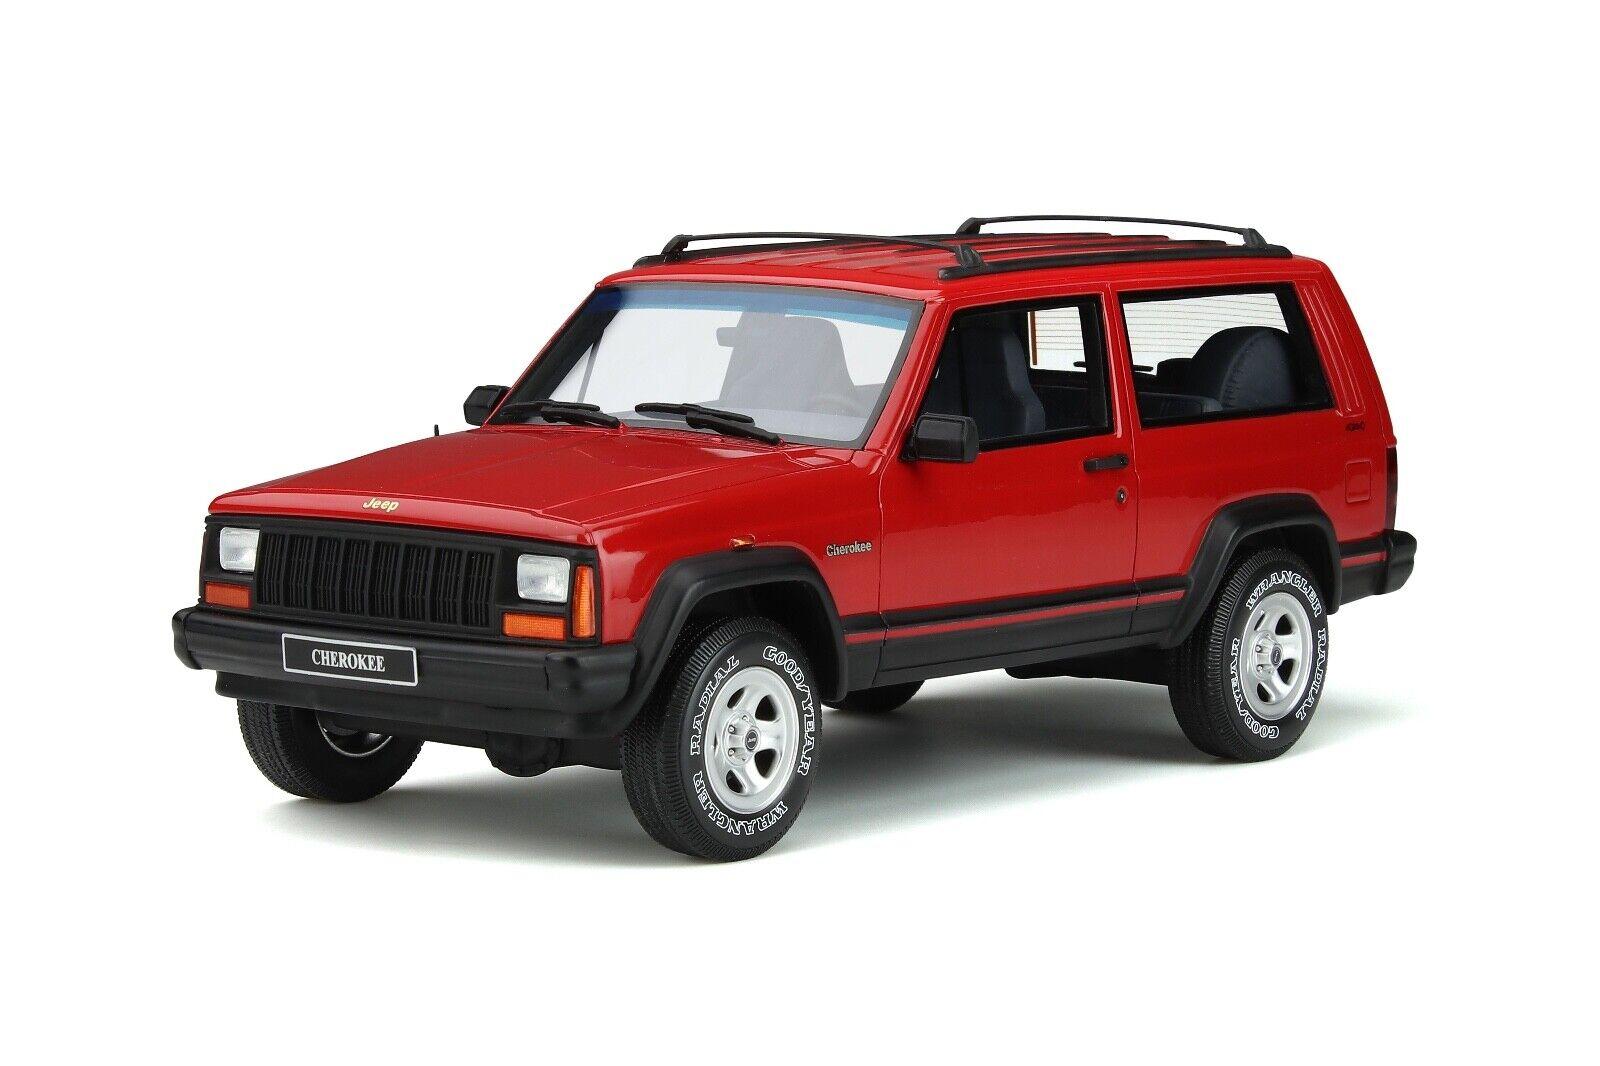 1   18 ottogt Spirit jeep Cherokee EFI 4x4, rojo, 1995 ot738